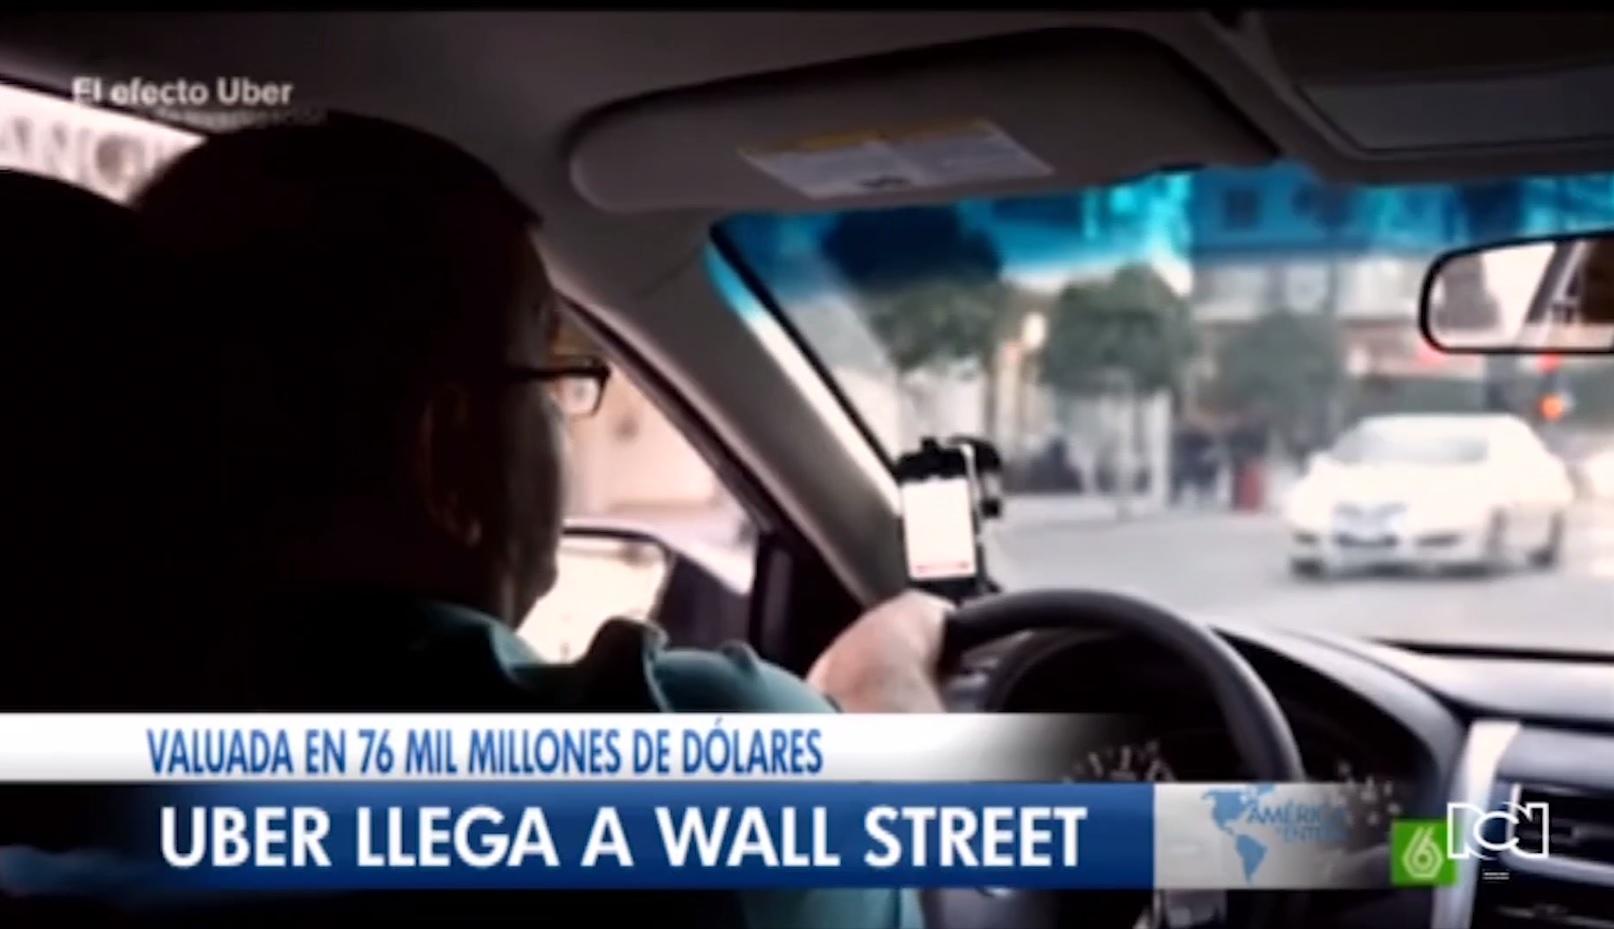 uber-llega-a-wall-street.jpg